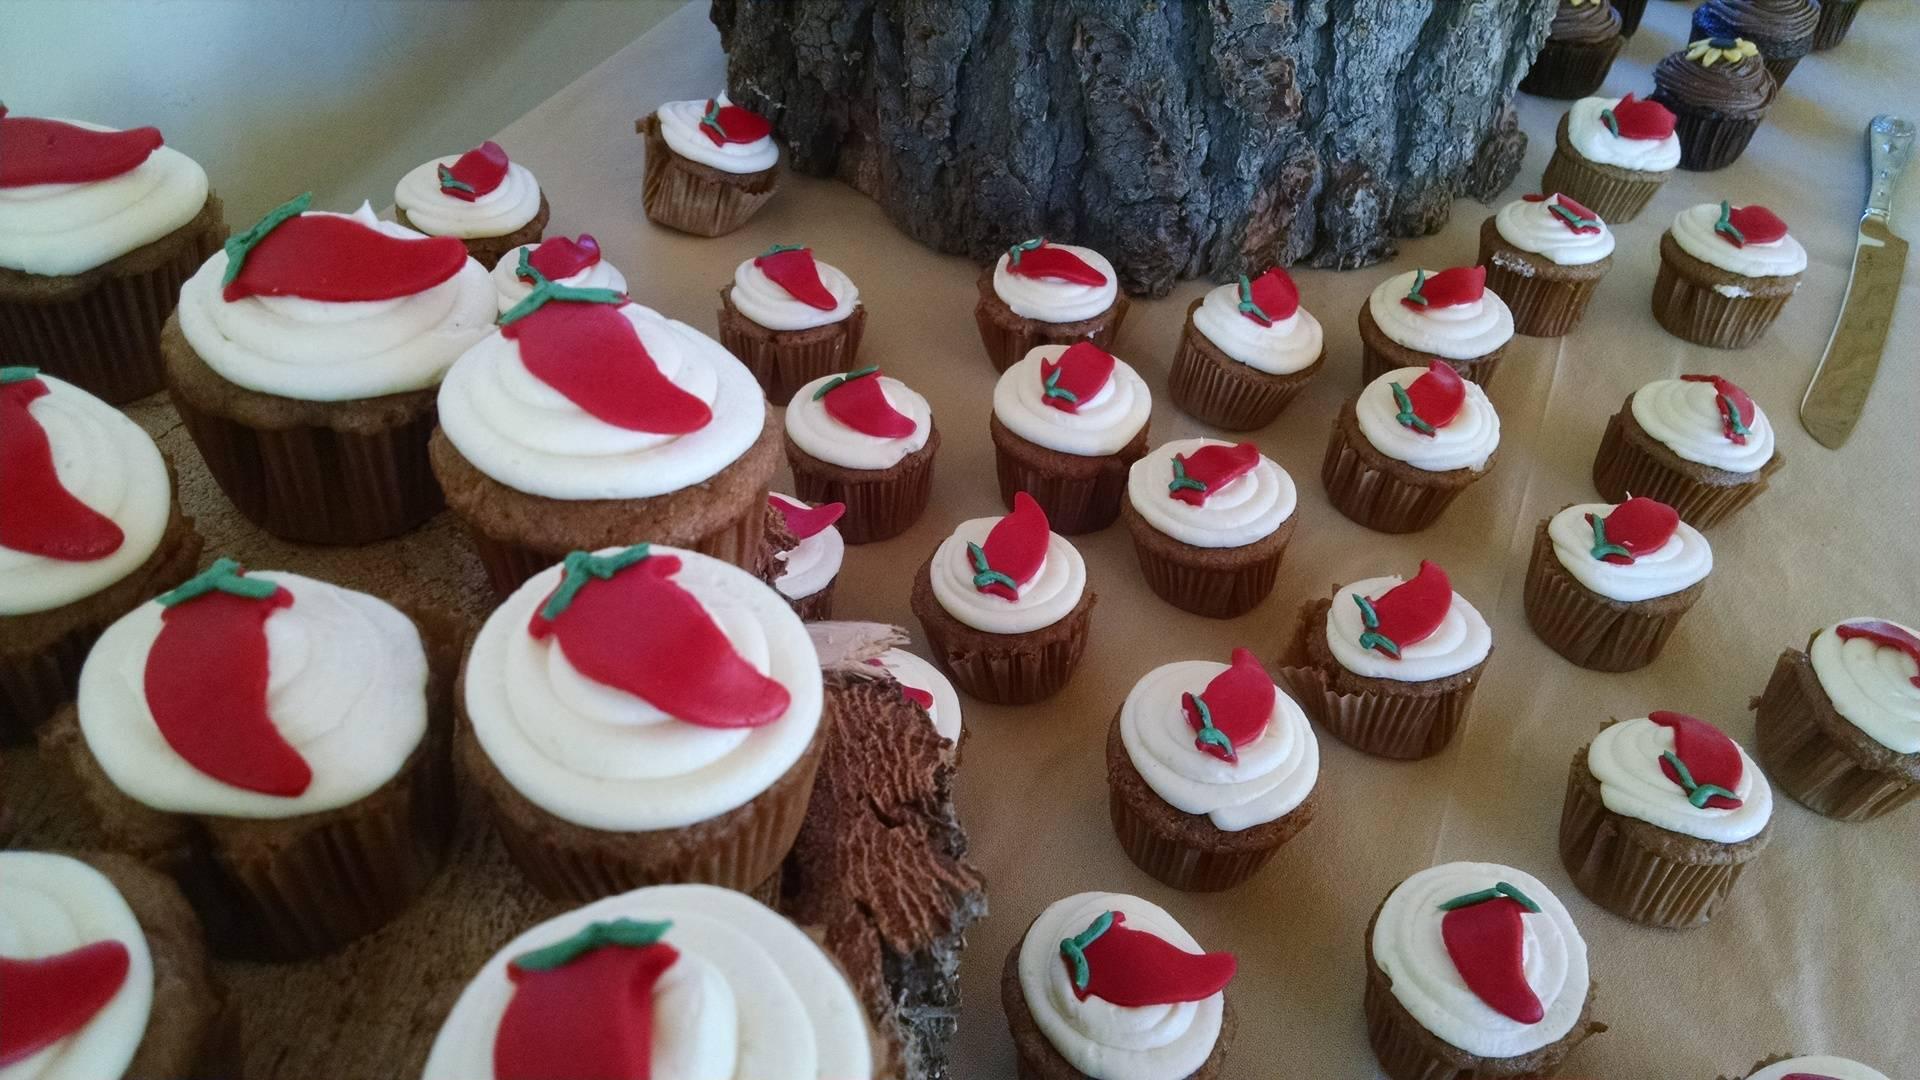 Red Chili Cupcakes